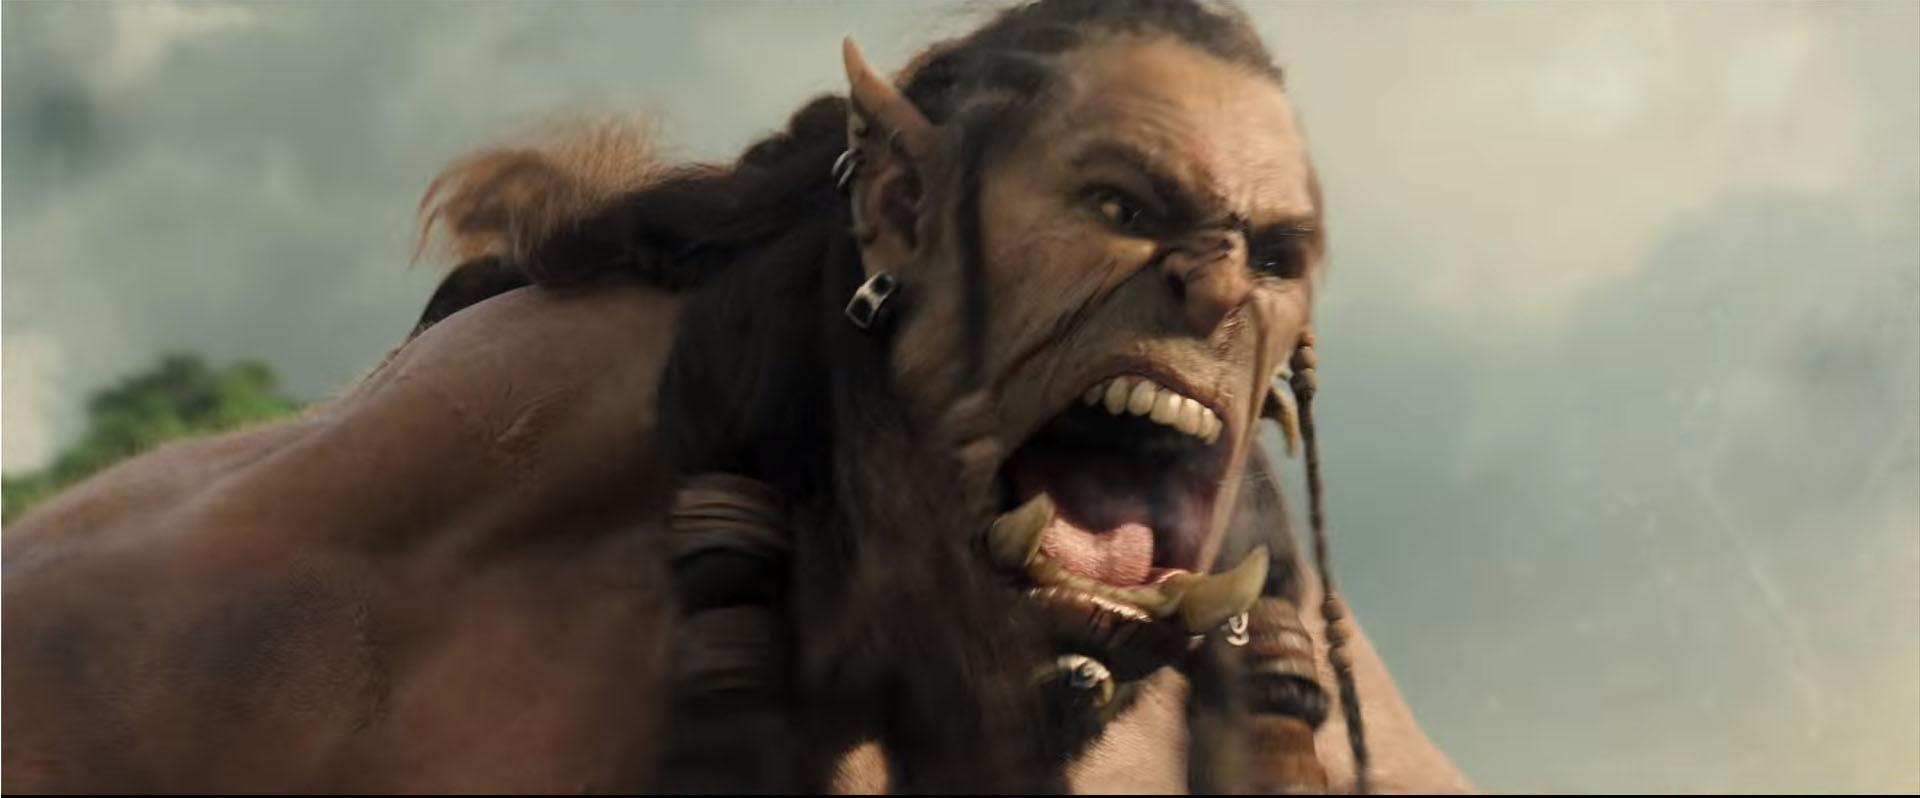 Warcraft Fragmanı 53